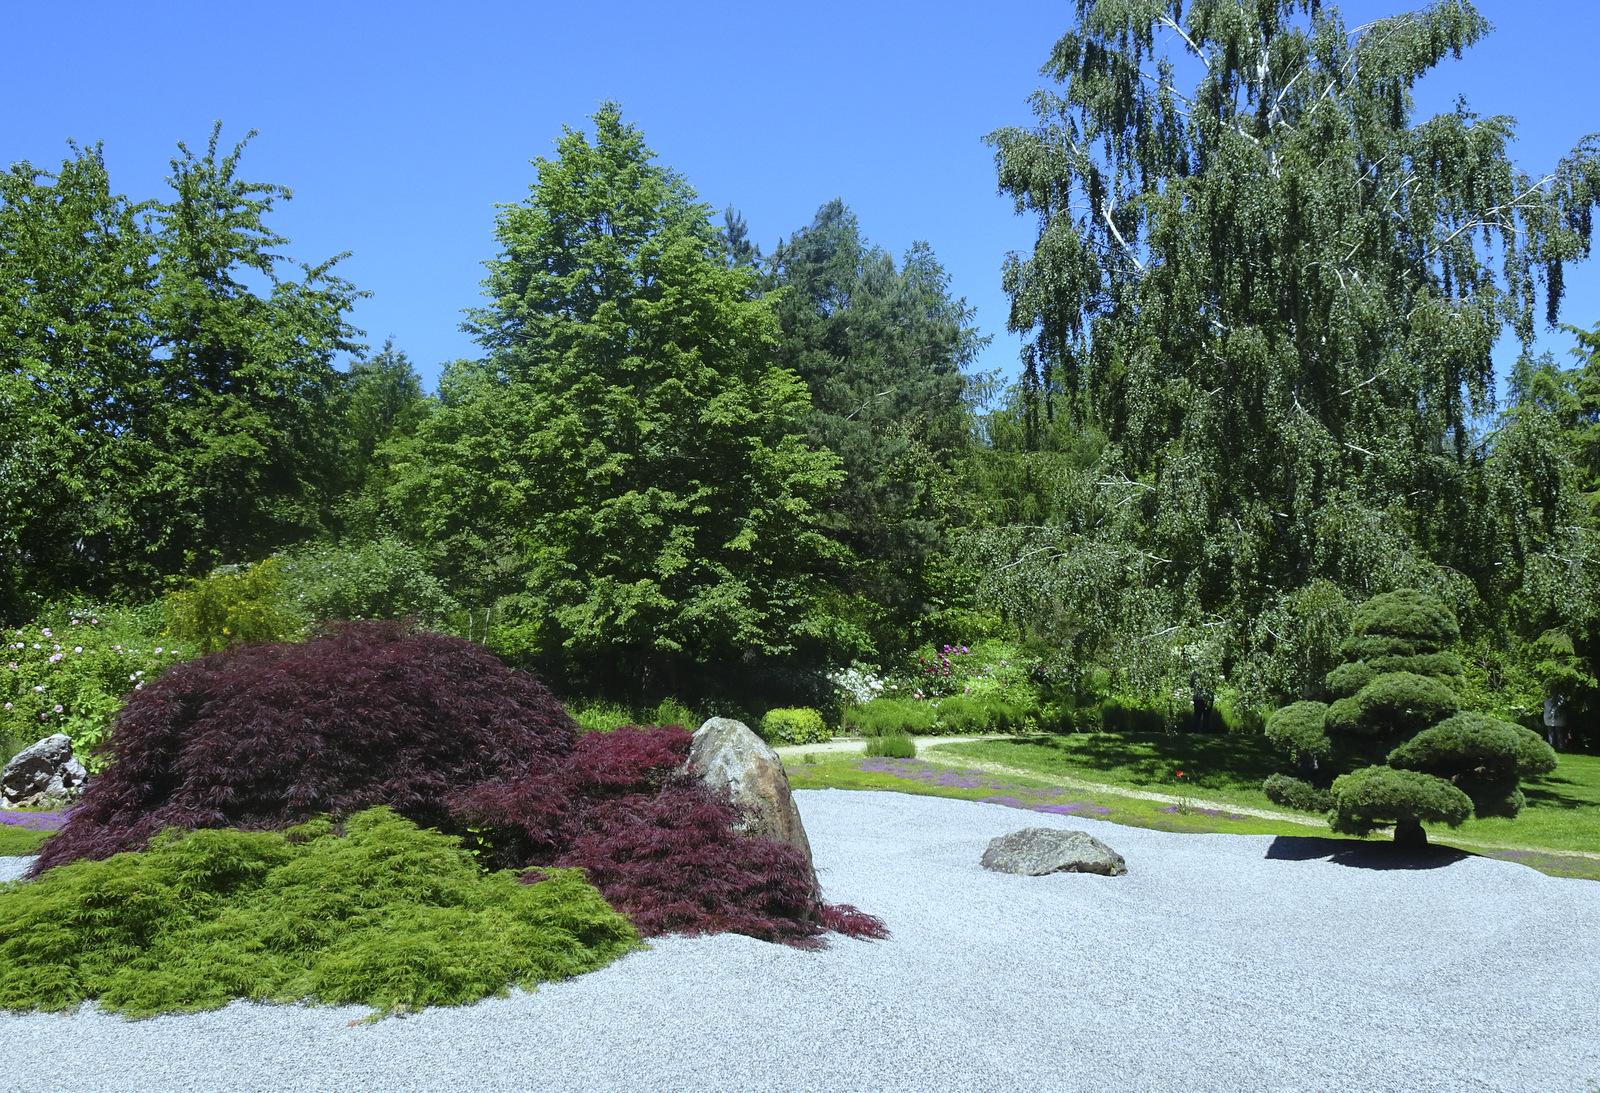 japanischer Garten.JPG